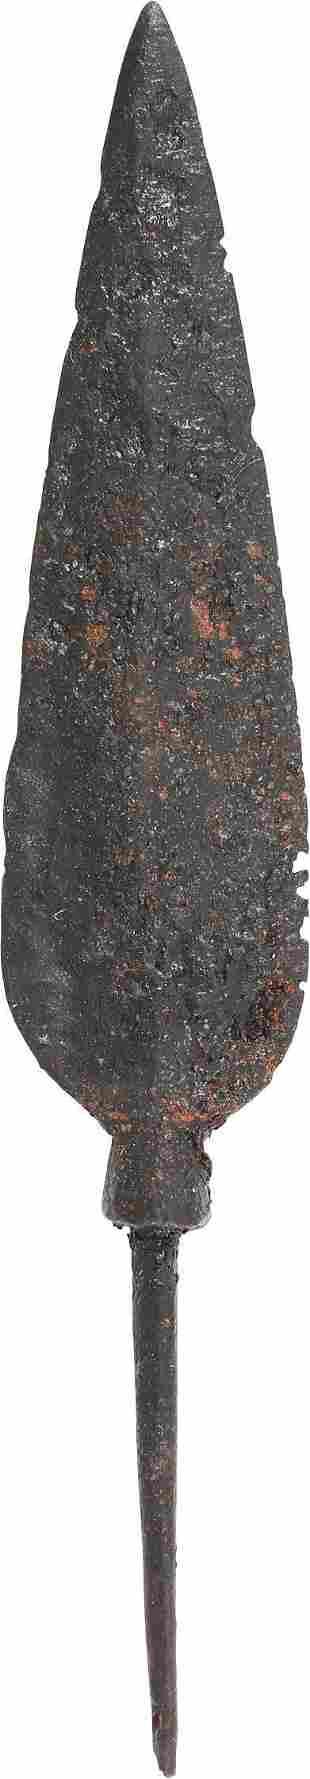 VIKING ARROWHEAD C.850-1100 AD